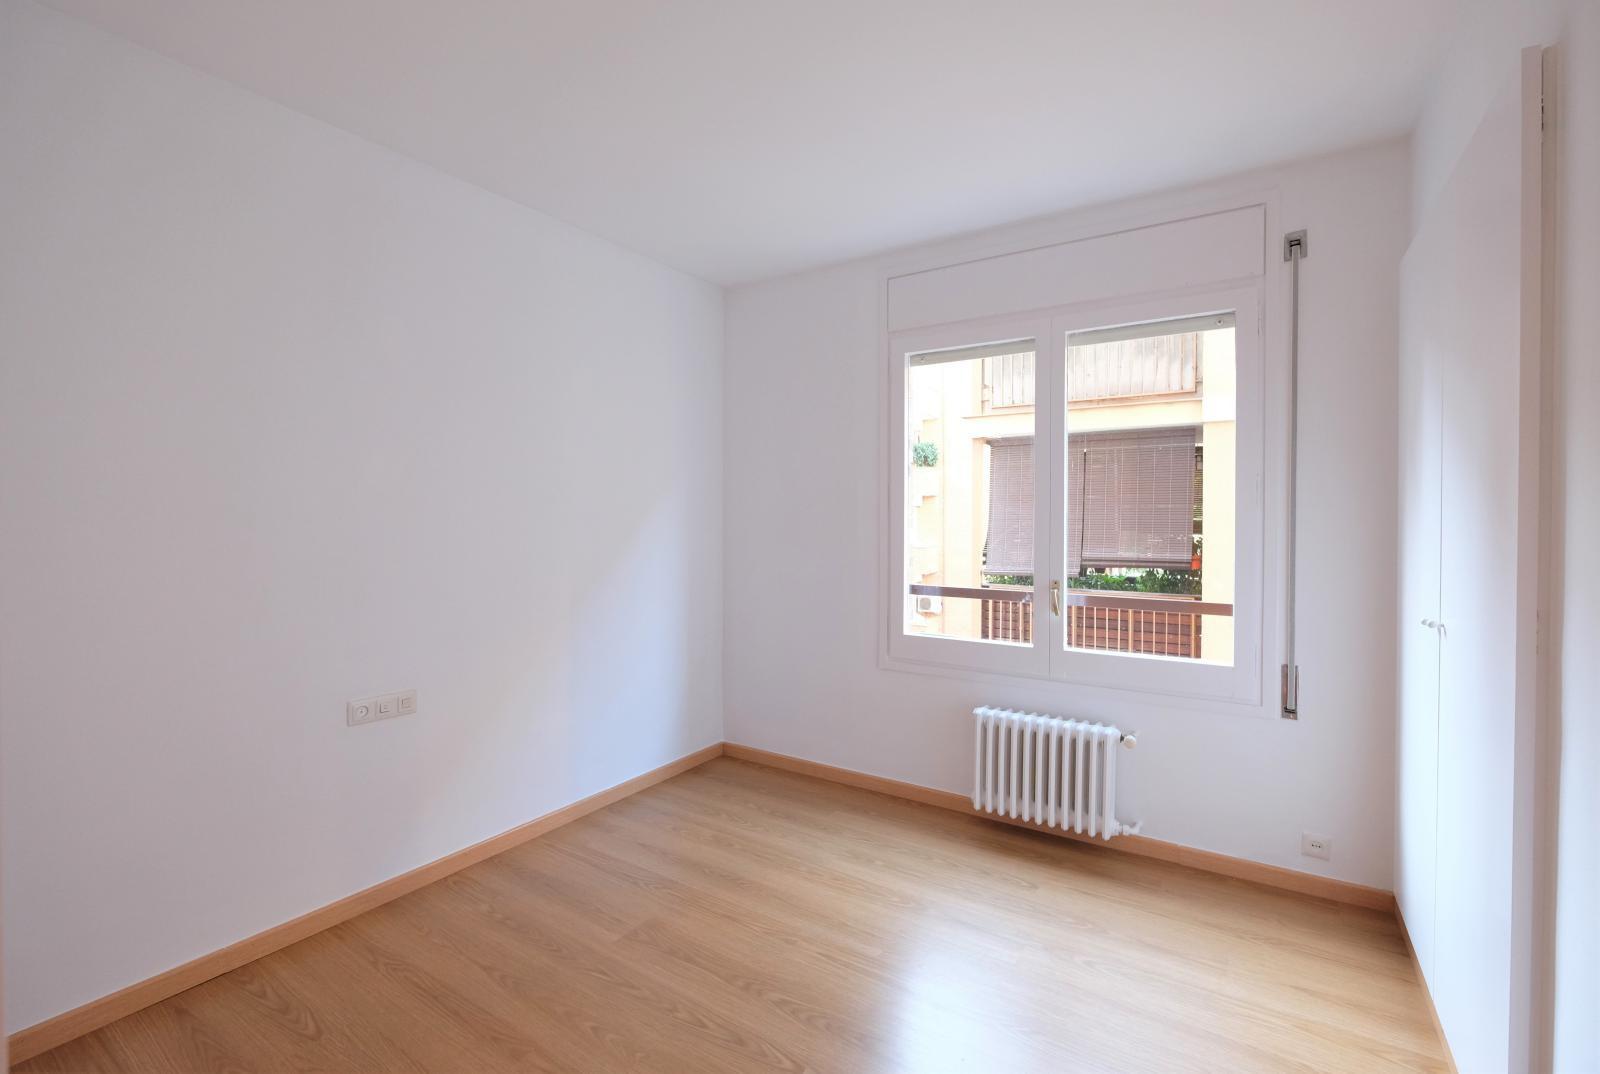 MG Inmobiliaria Barcelona - via-augusta-junto-vergos-angli